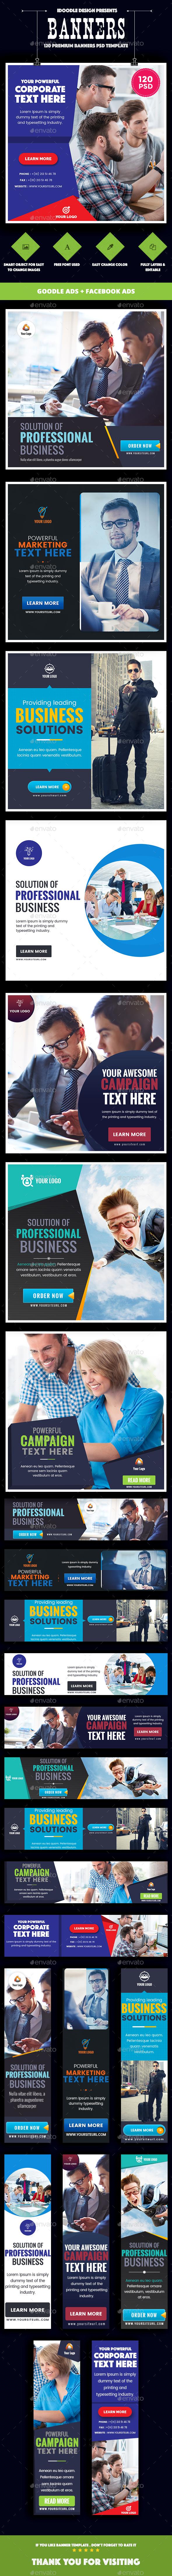 [Special Bundle] - Multipurpose Banner Ads - 120 PSD [08 Sets] - Banners & Ads Web Elements